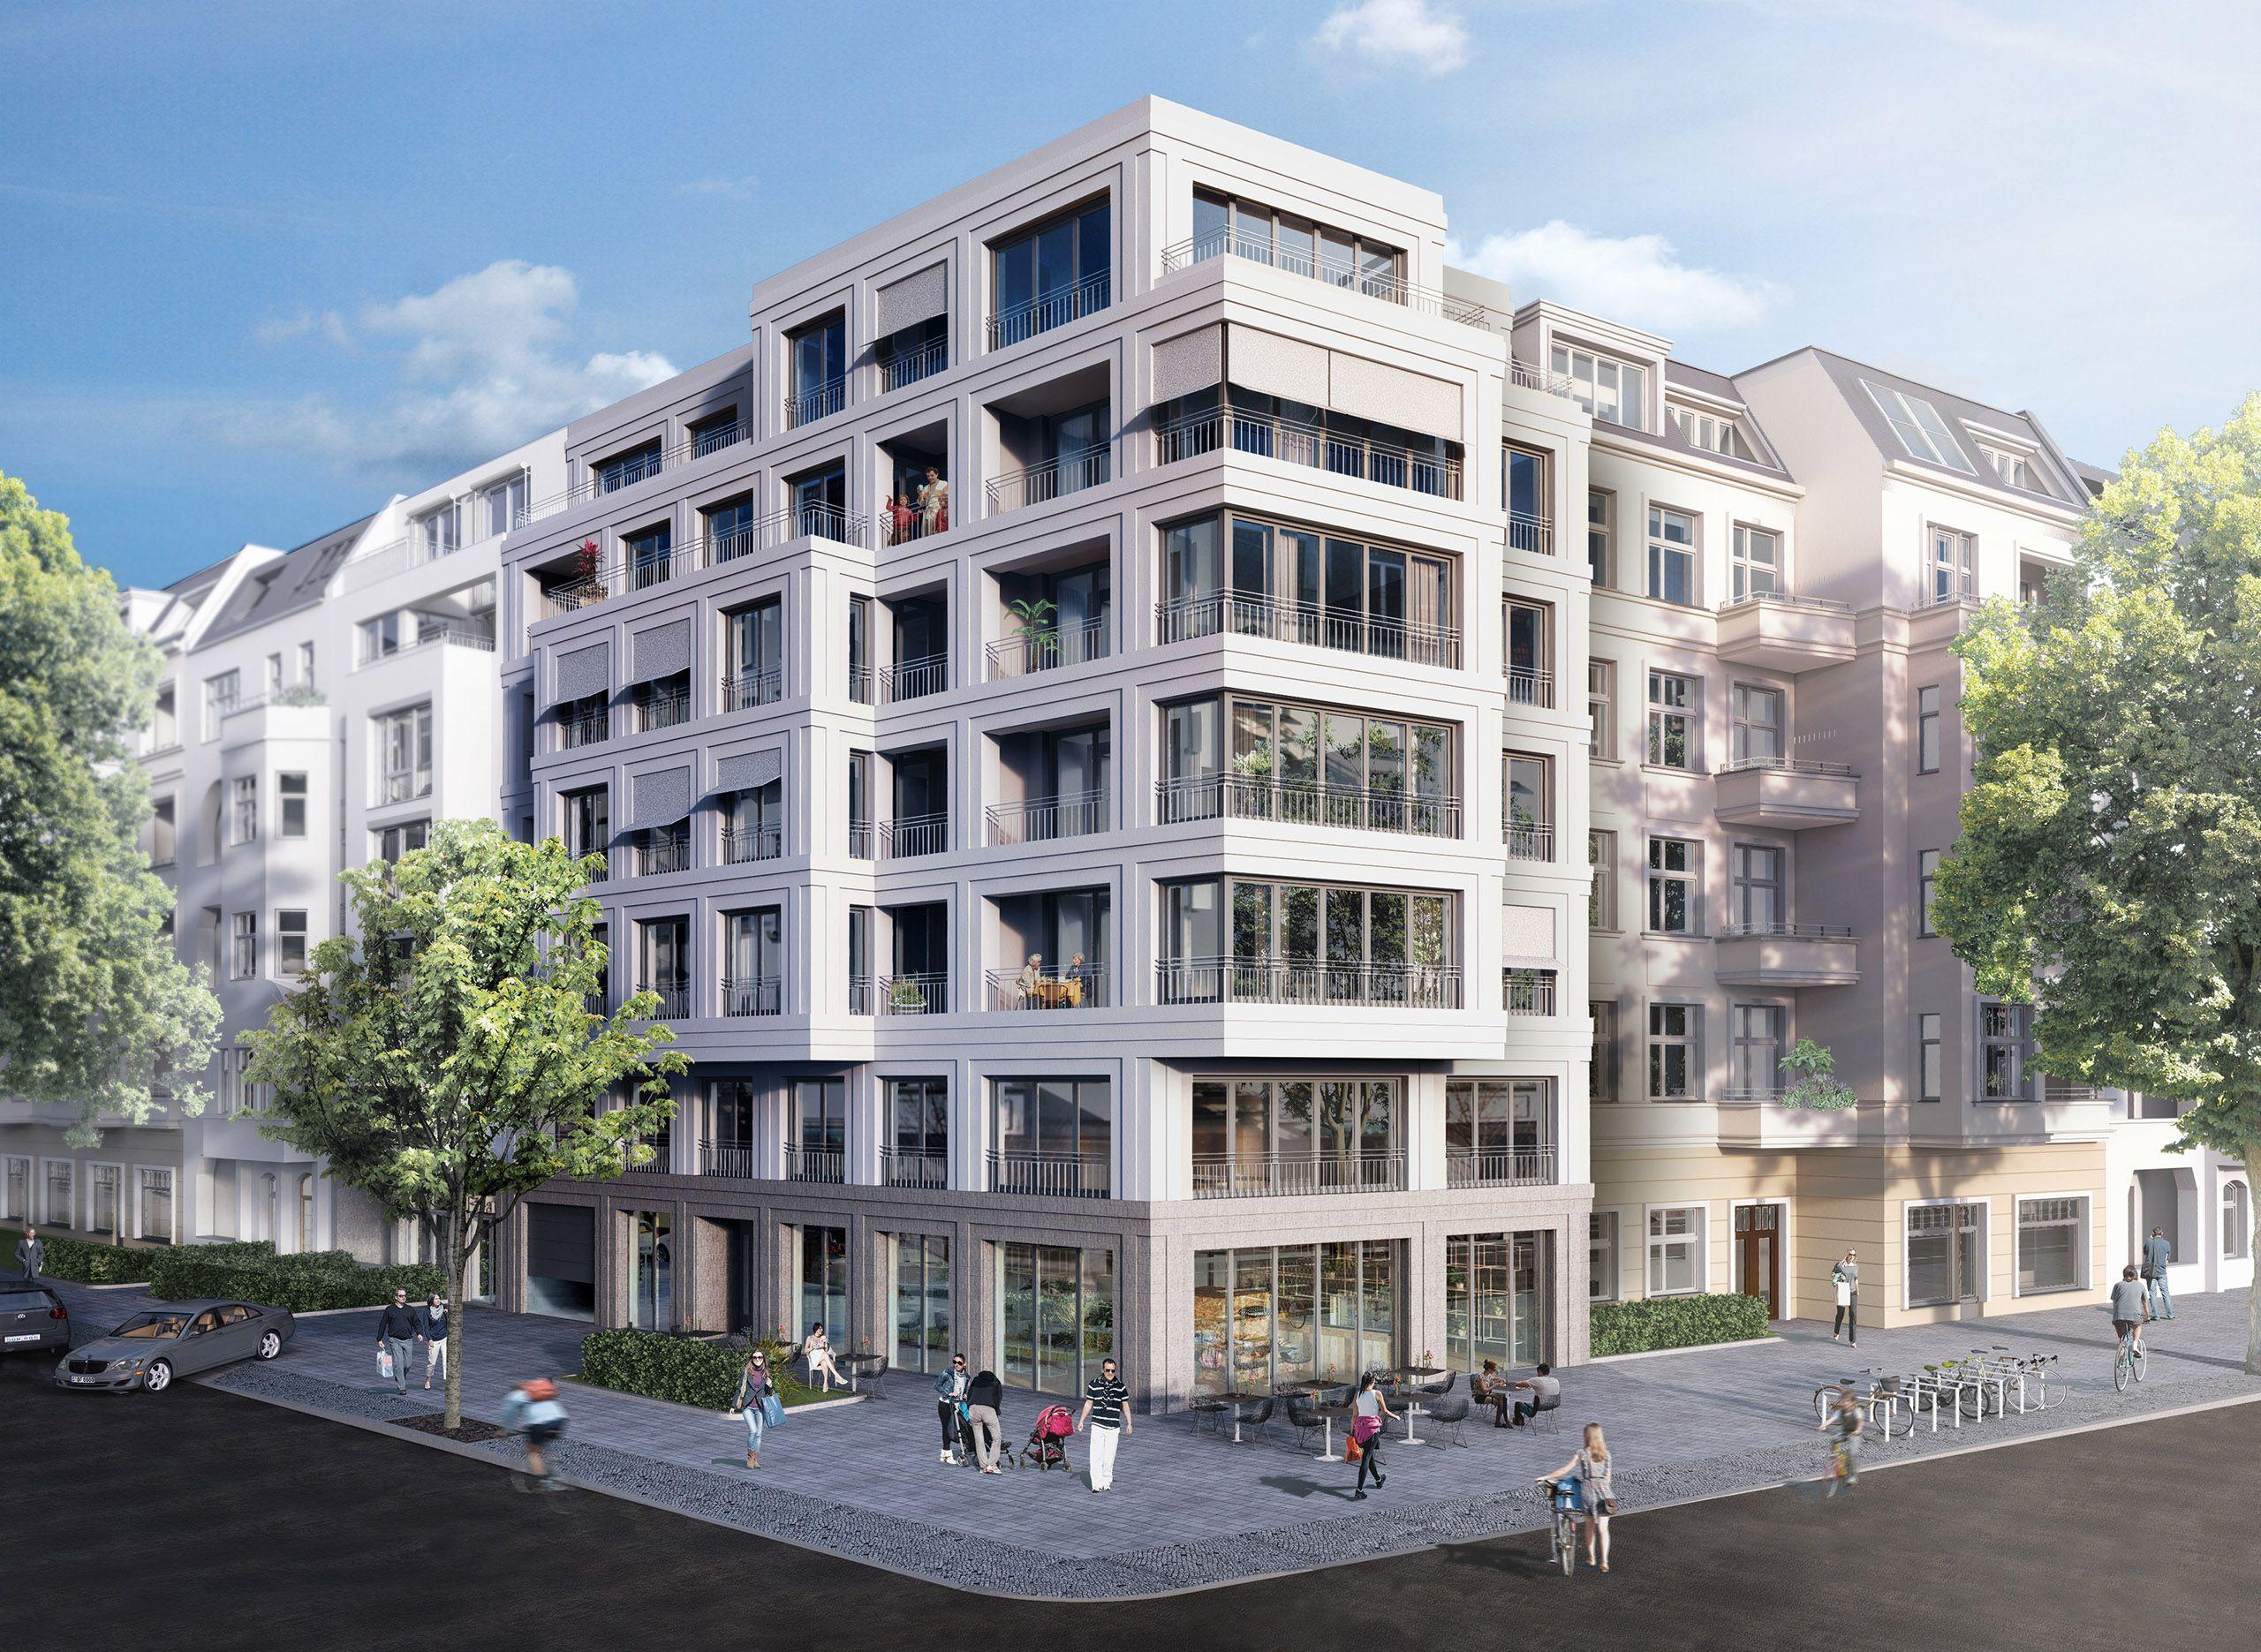 Architekturvisualisierung Berlin berlin charlotteburg city joachim friedrich straße loft